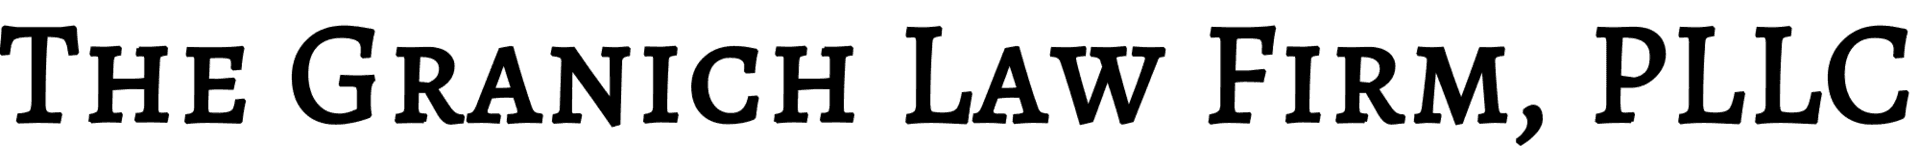 The Granich Law Firm - logo